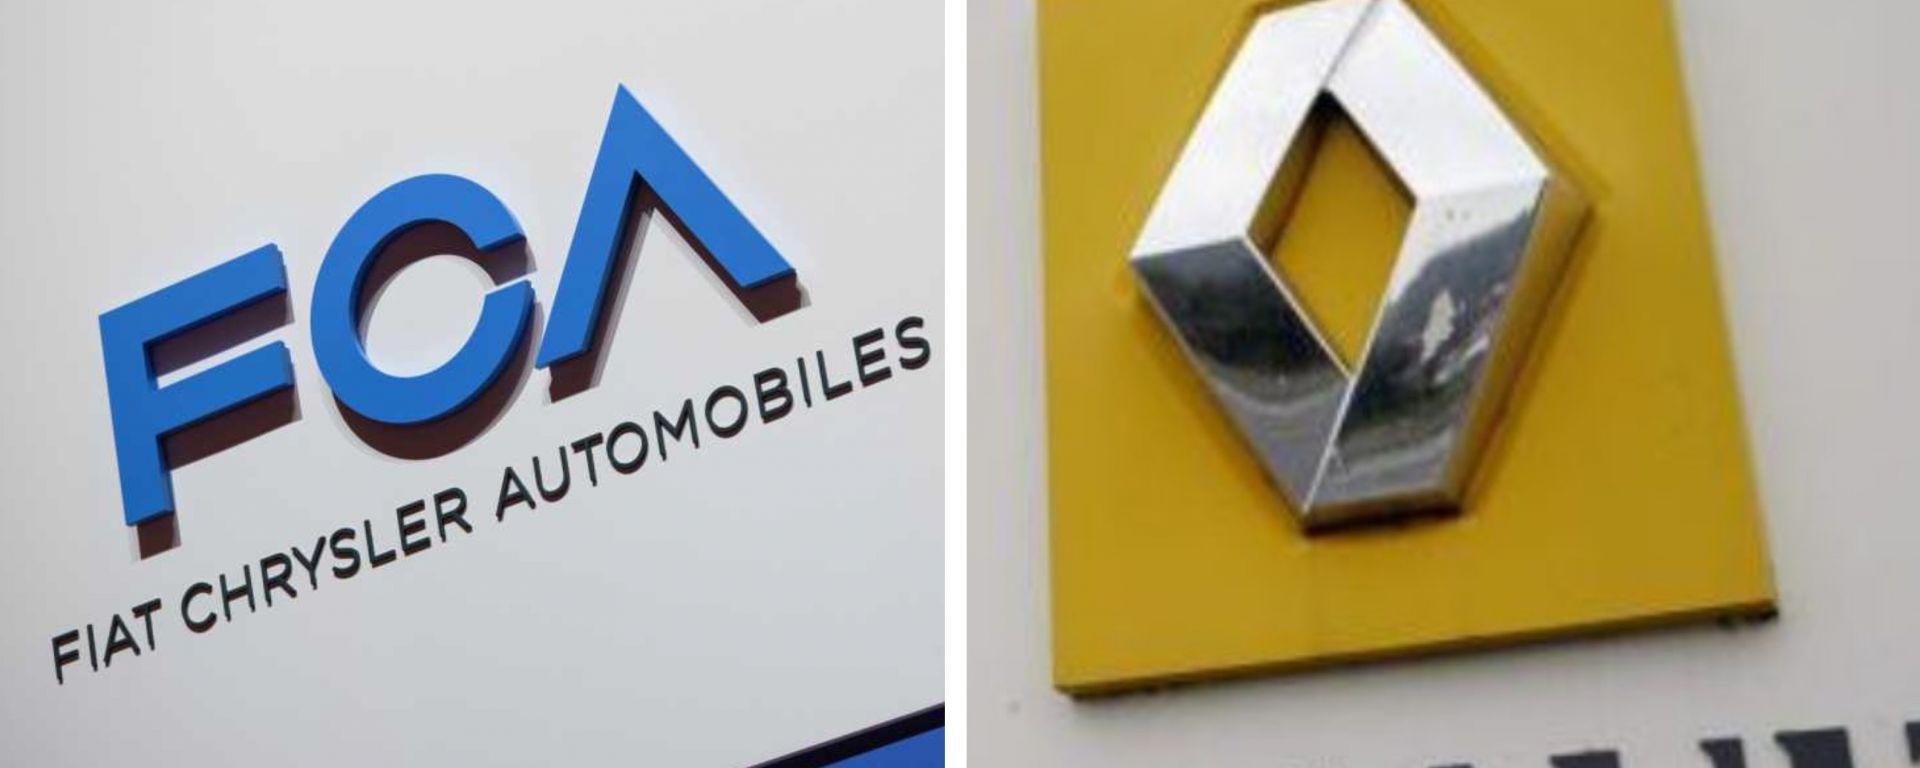 FCA, un possibile futuro insieme a Renault-Nissan?